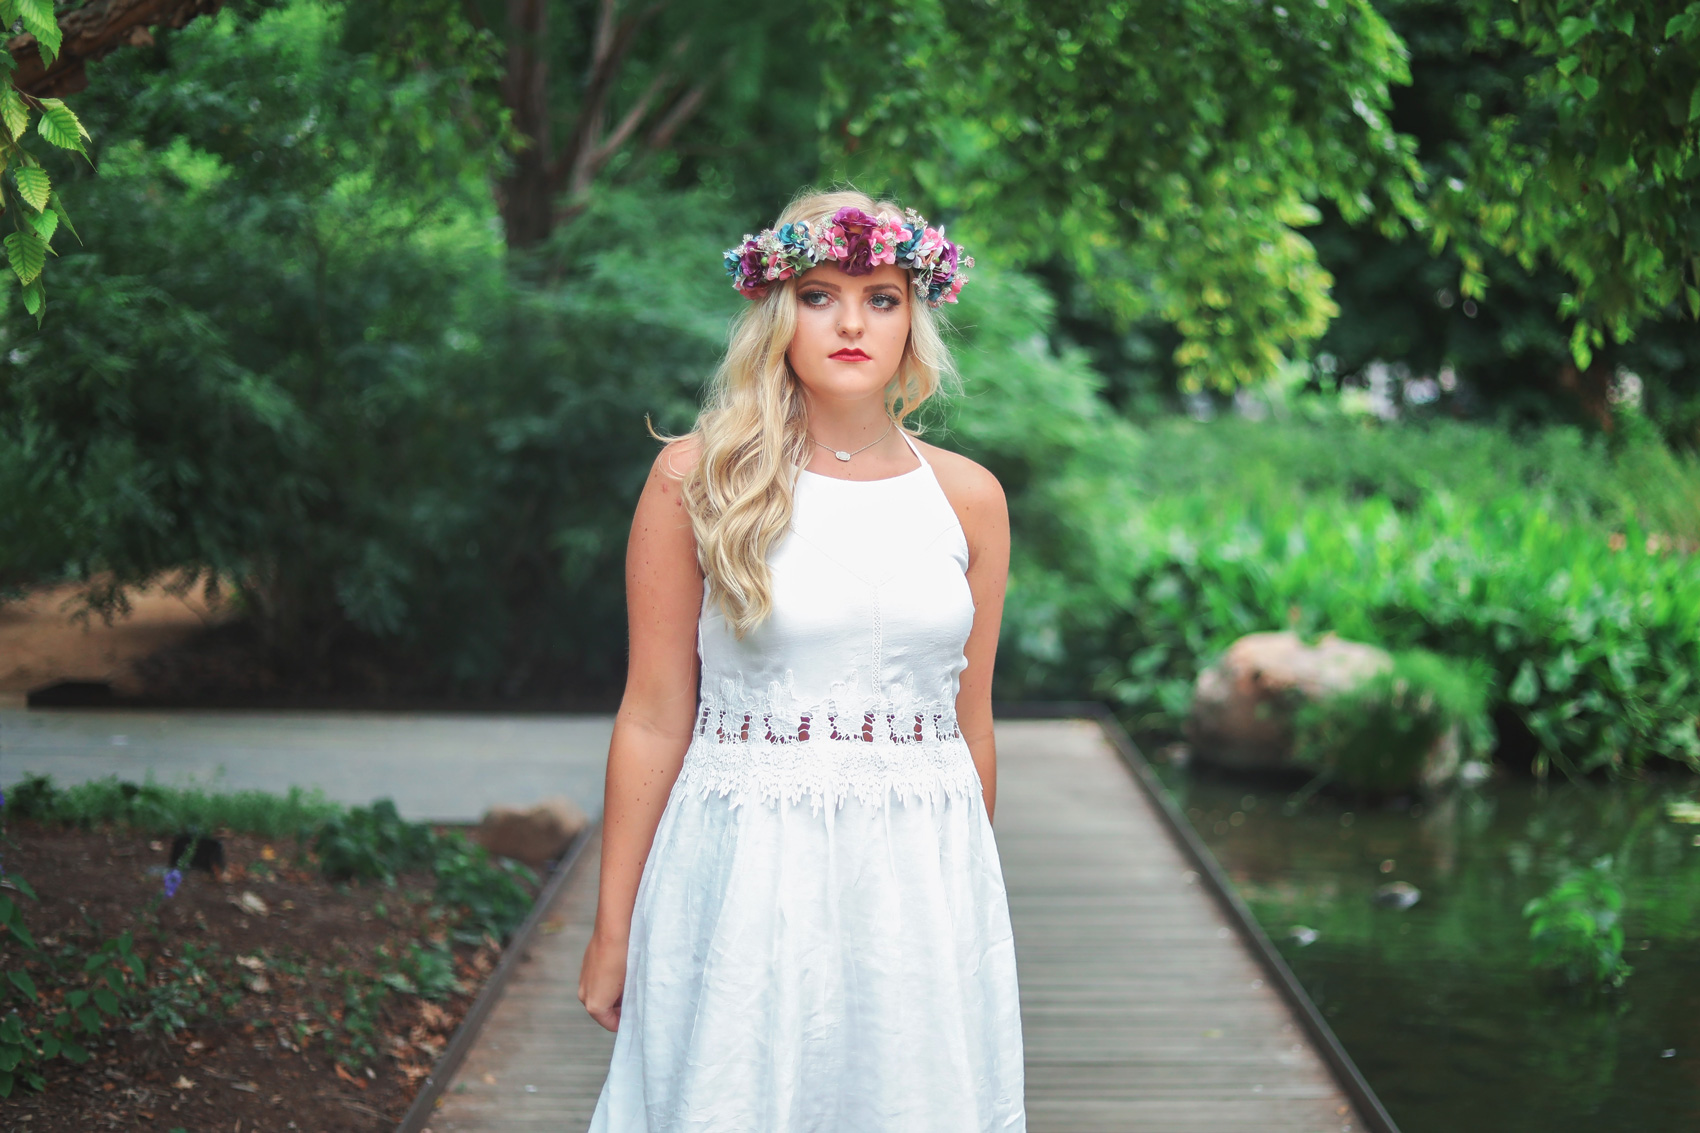 Oklahoma-City-Senior-Photographer-Amanda-Lynn-Myriad-Gardens-Kristen2.jpg